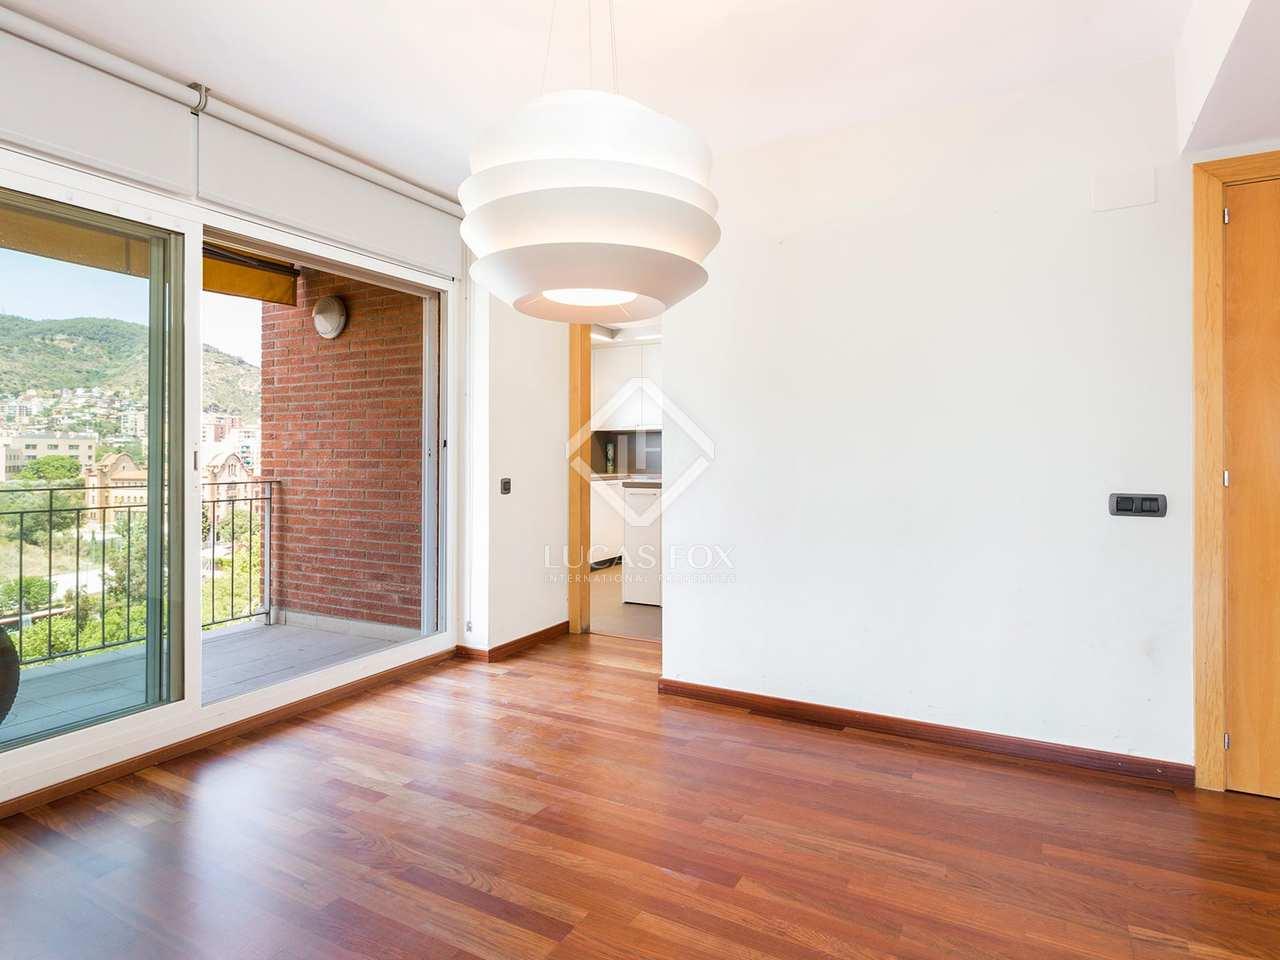 Casa de 5 dormitorios con piscina en alquiler en gracia for Casa con jardin alquiler barcelona